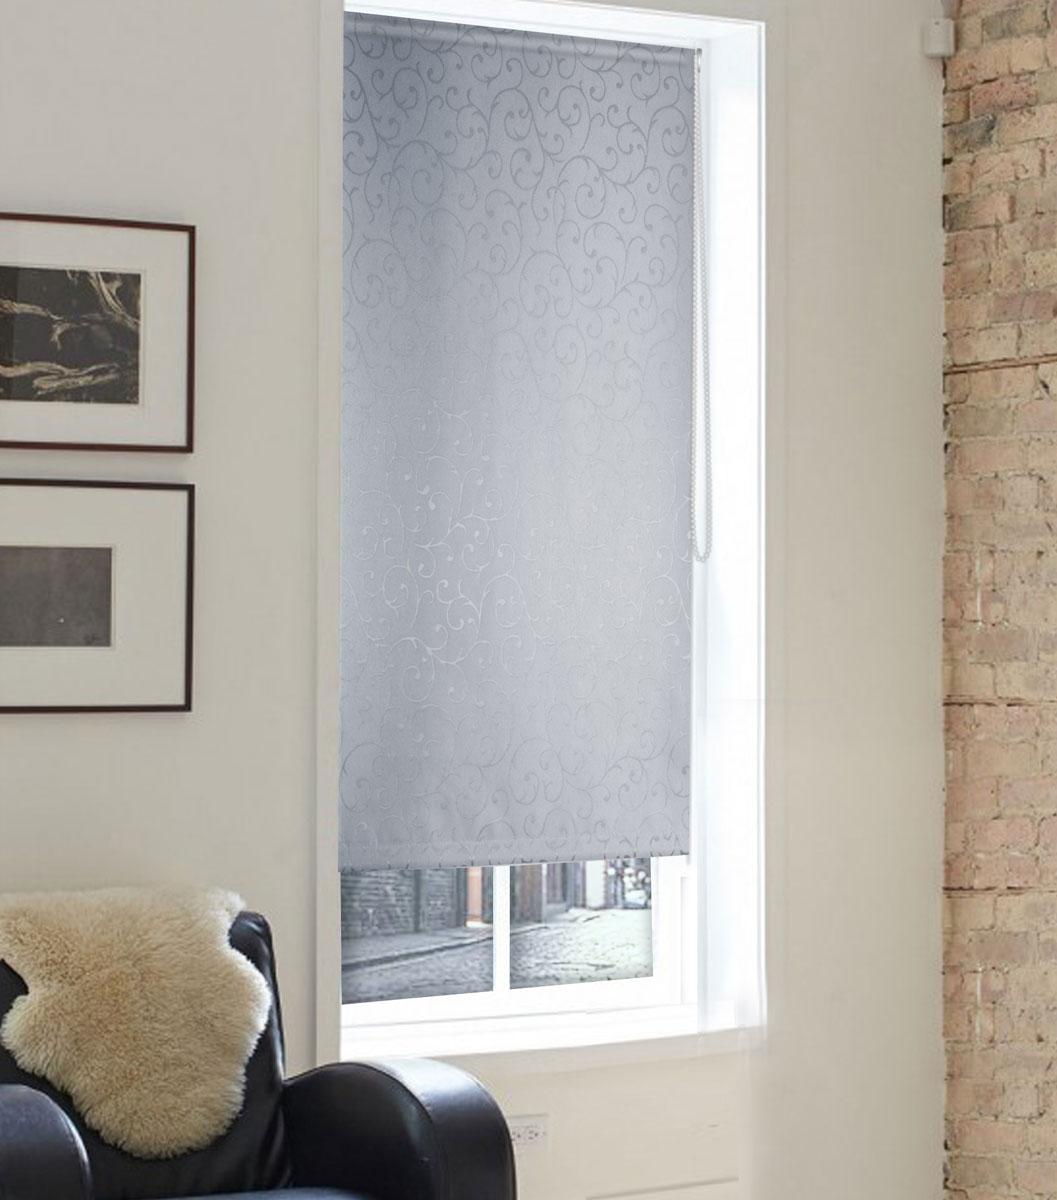 Штора рулонная Эскар Миниролло. Агат, цвет: серый, ширина 37 см, высота 160 см штора рулонная эскар миниролло агат цвет серый ширина 73 см высота 160 см